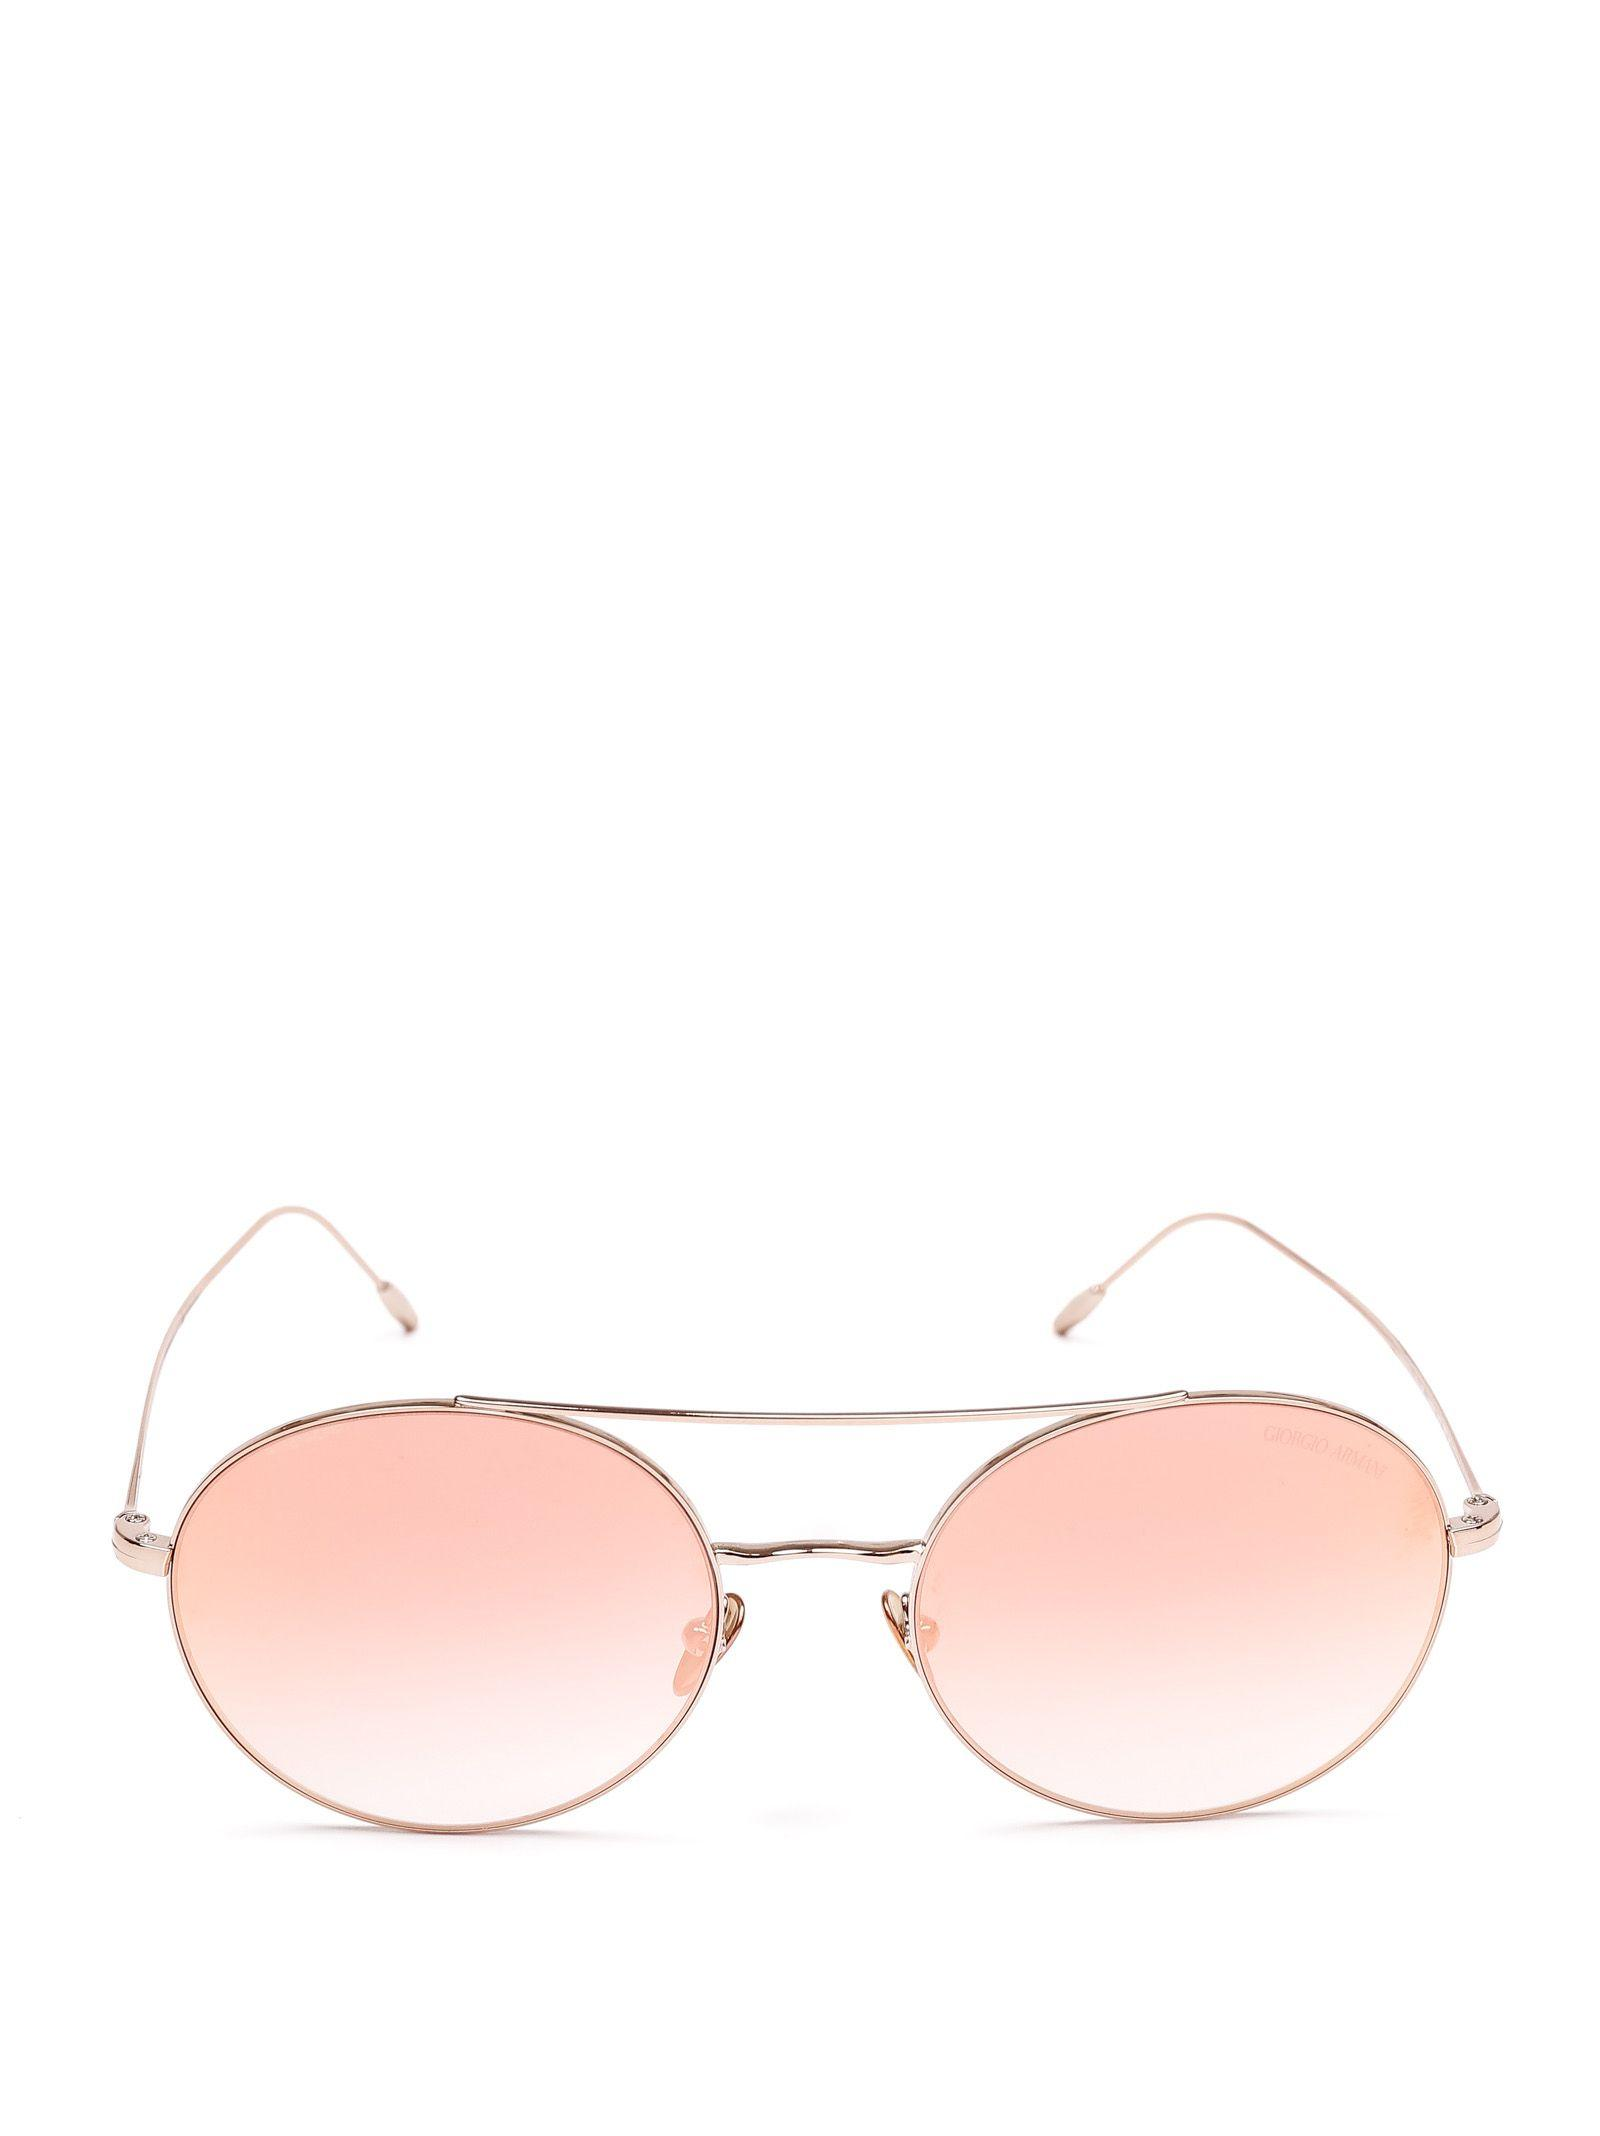 488f914c7a4 Giorgio Armani Gold Metal Sunglasses in Metallic - Lyst